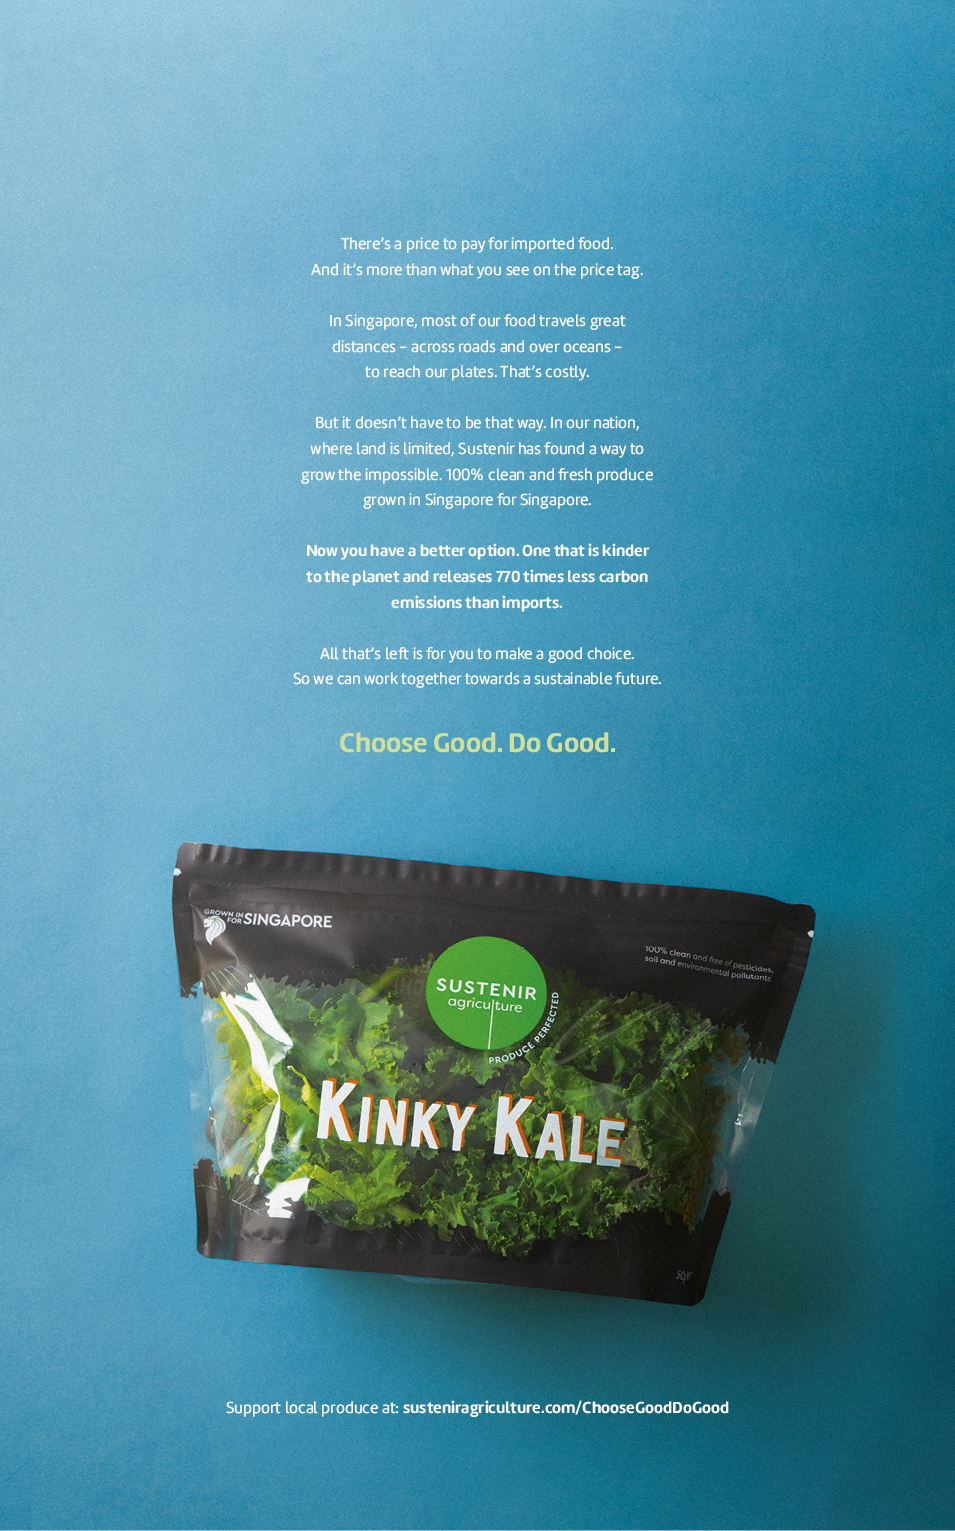 Iris launches Choose Good. Do Good. campaign for hydroponic farm Sustenir in Singapore